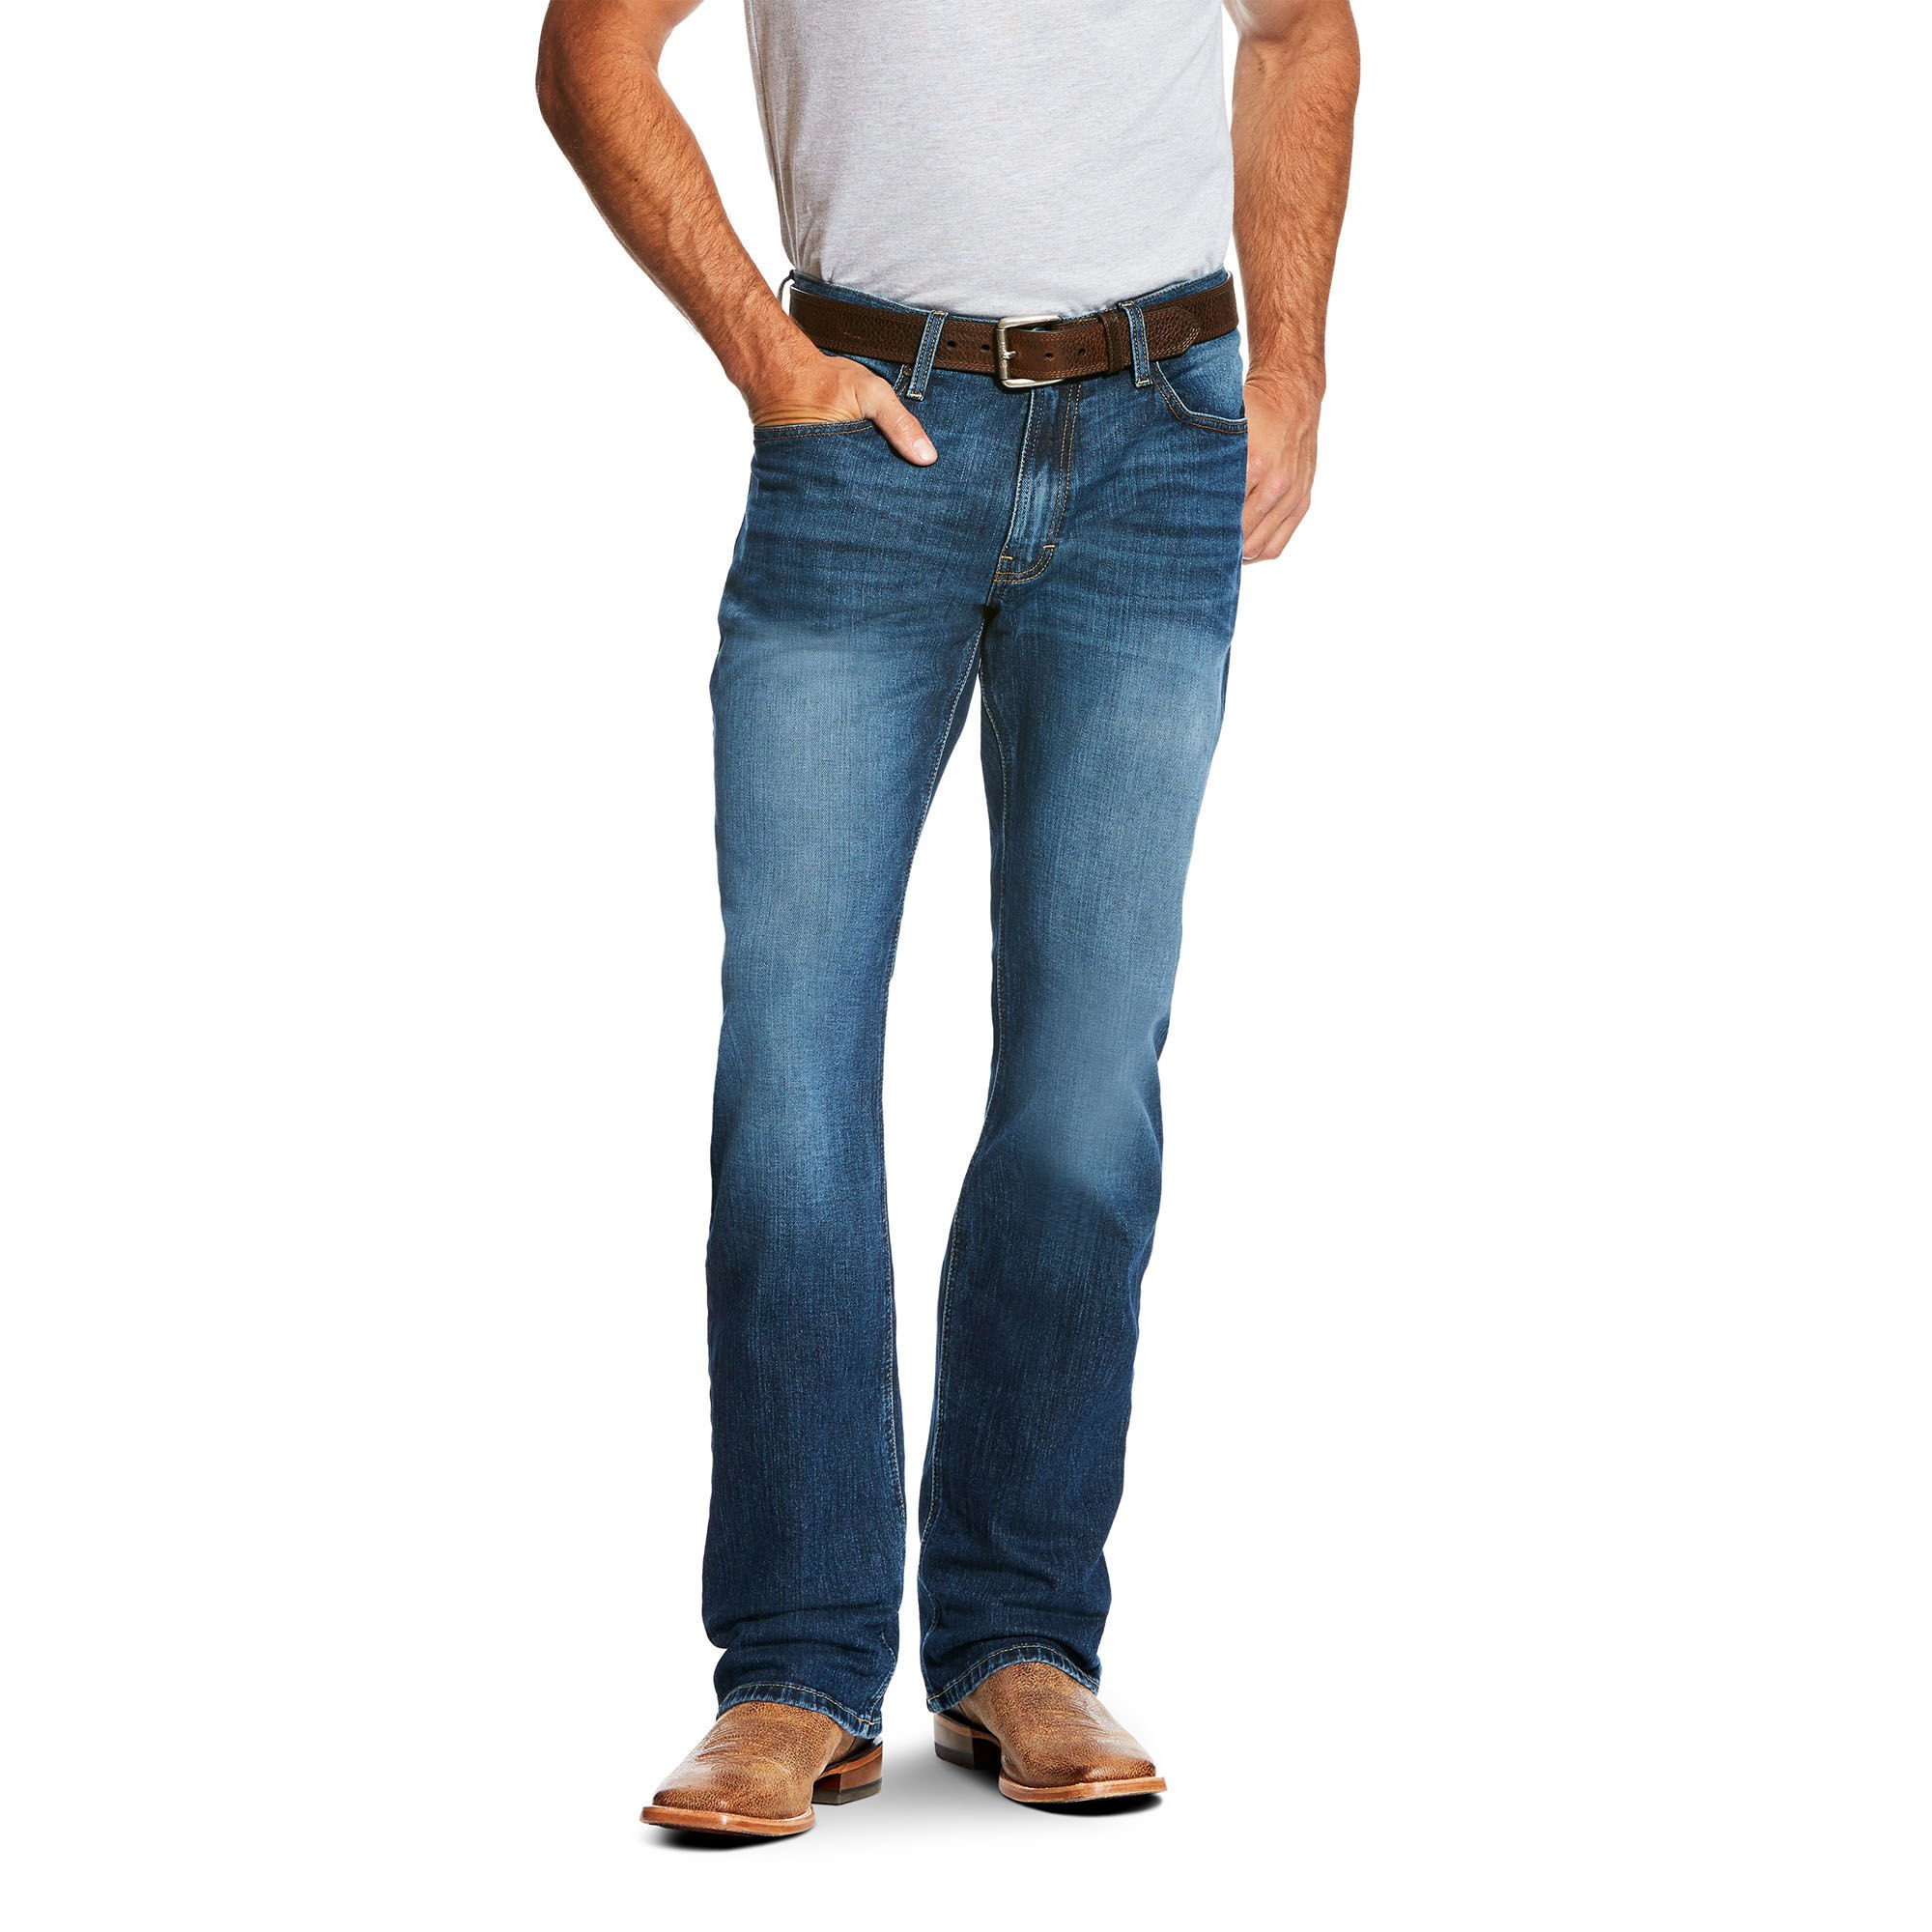 Ariat Men's M4 Low Rise Boot Cut Jean, Stretch Freeman, 33X34